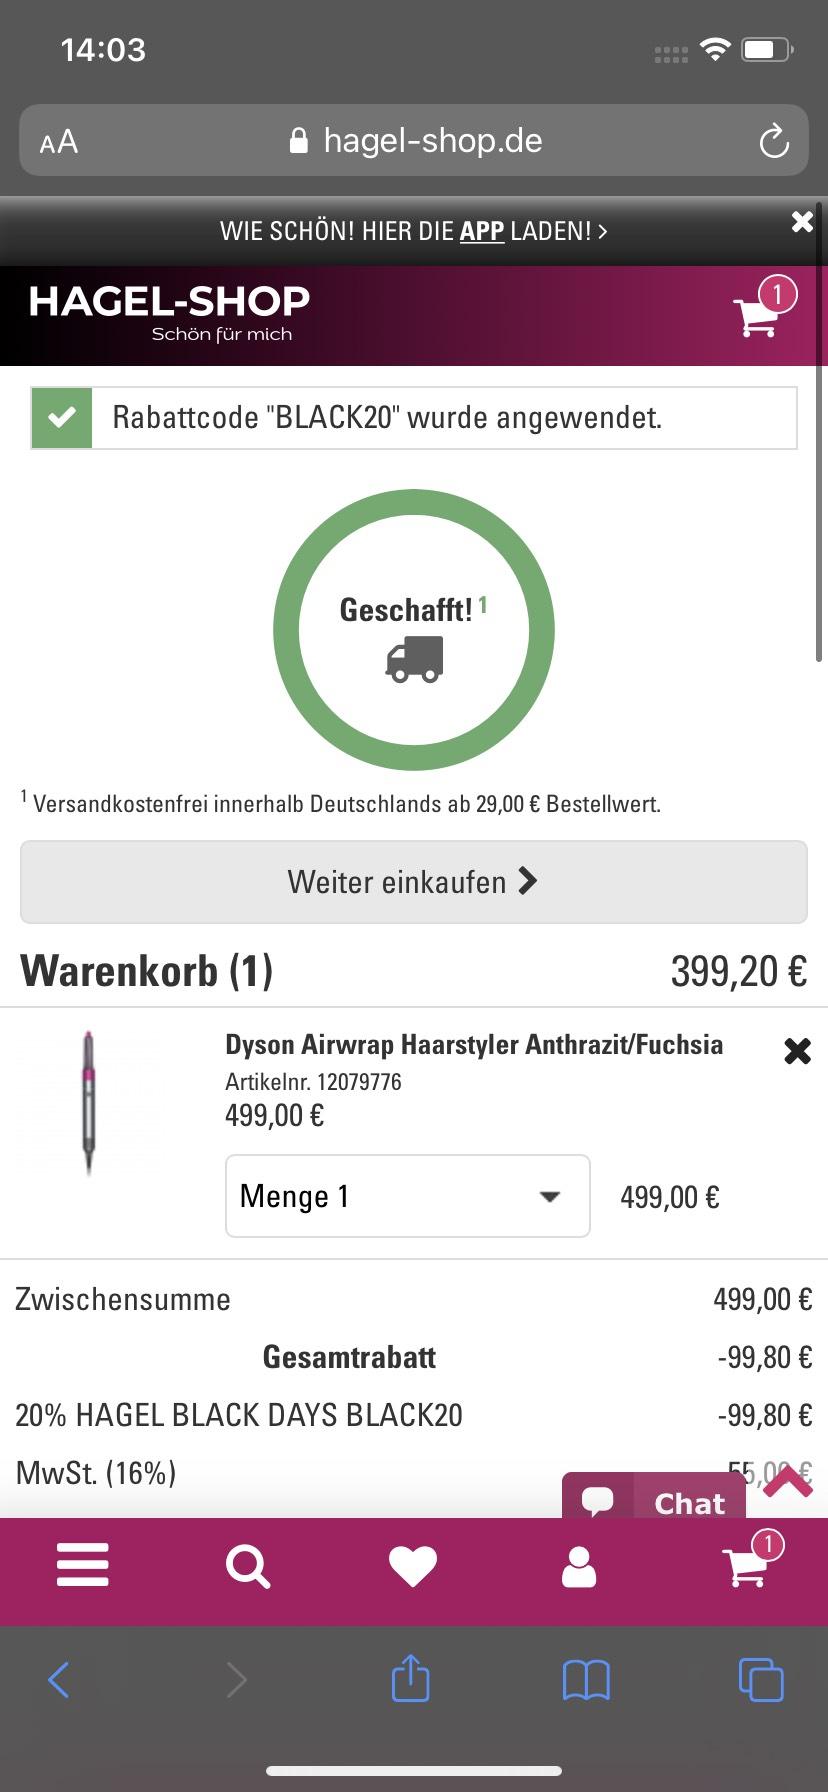 Dyson Air Wrap bei Hagel für 399,20€